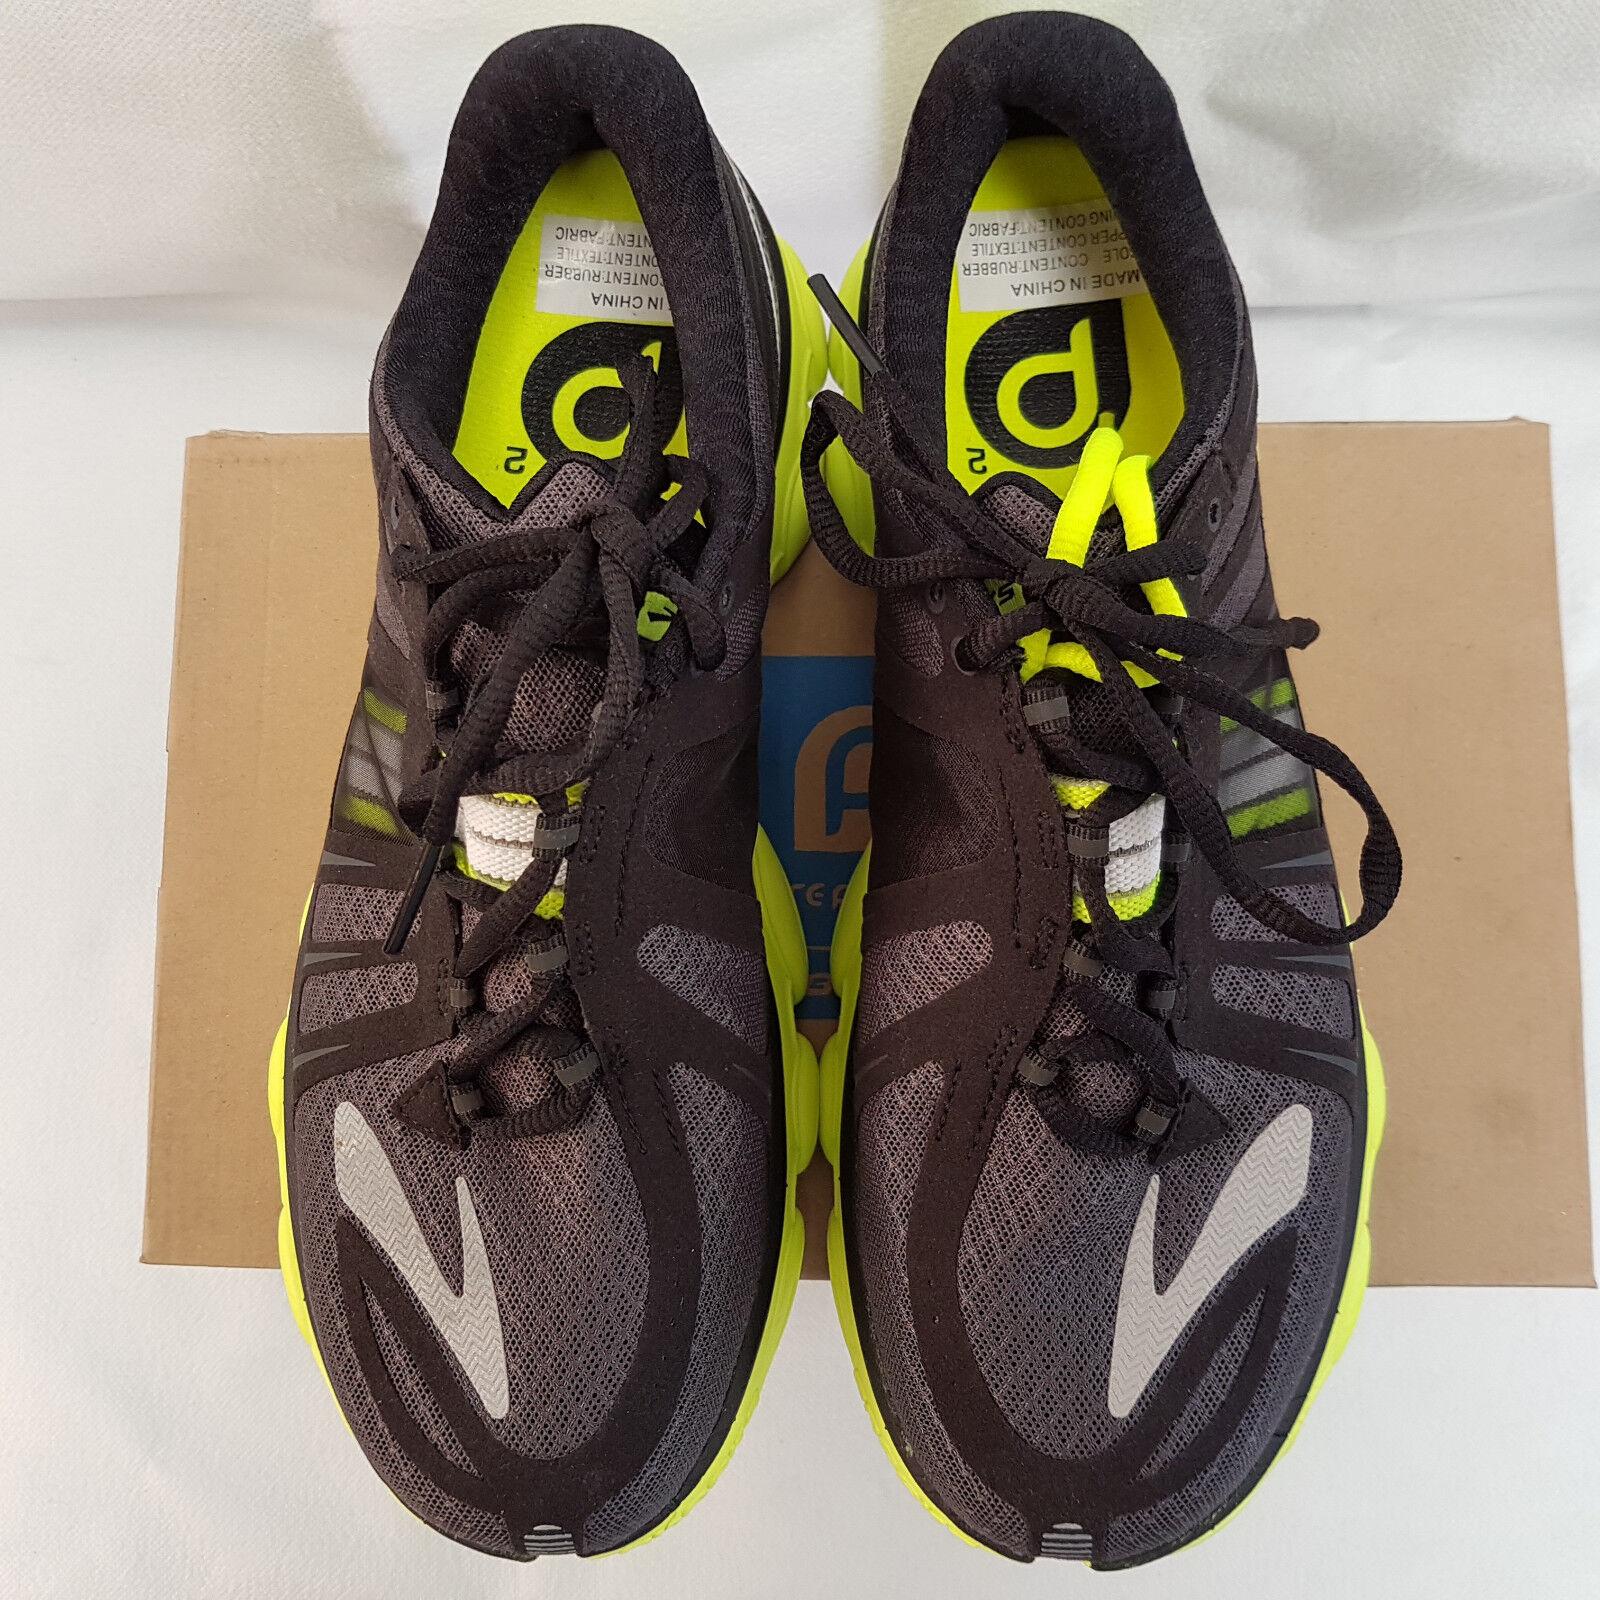 Brooks Pureflow 2 Womens Running Shoes/Sneaker (B) (735)   RRP $200.00 NIB